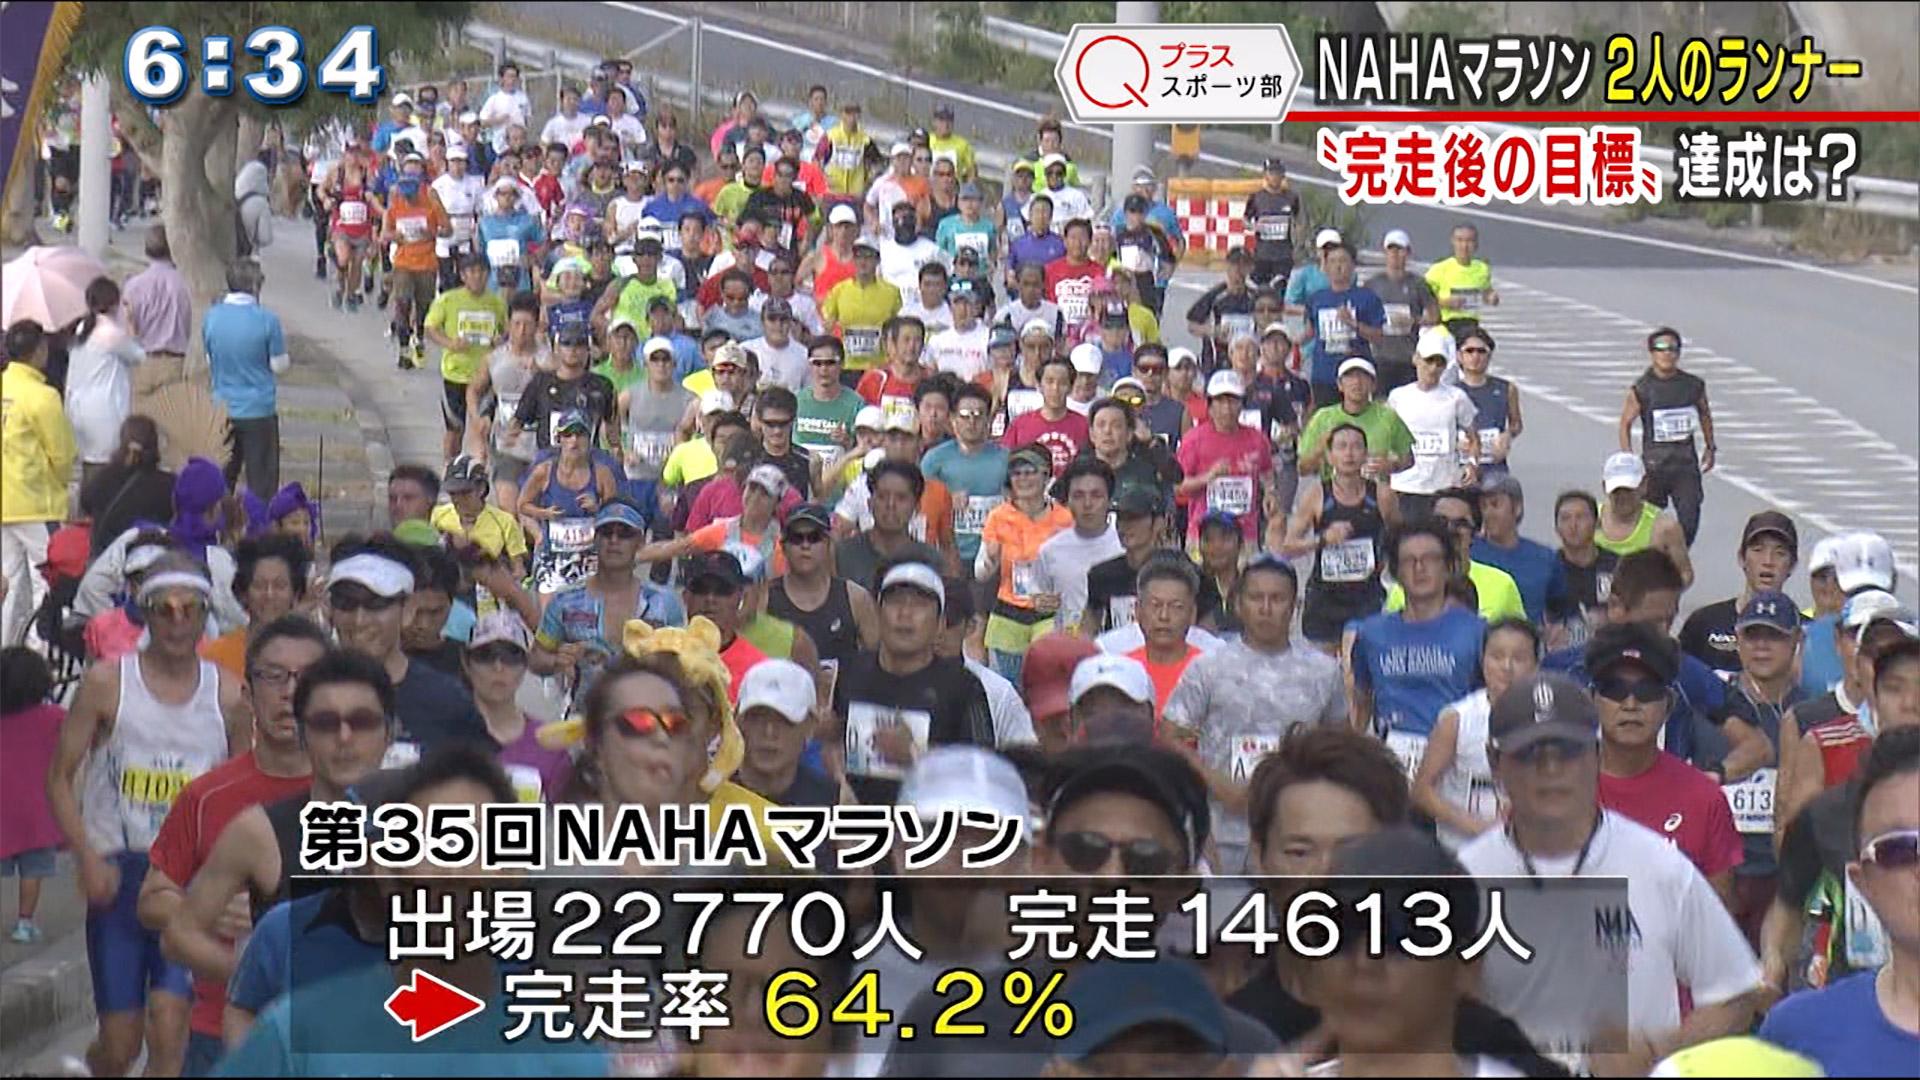 NAHAマラソン 2人のランナー「それぞれの目標」とは